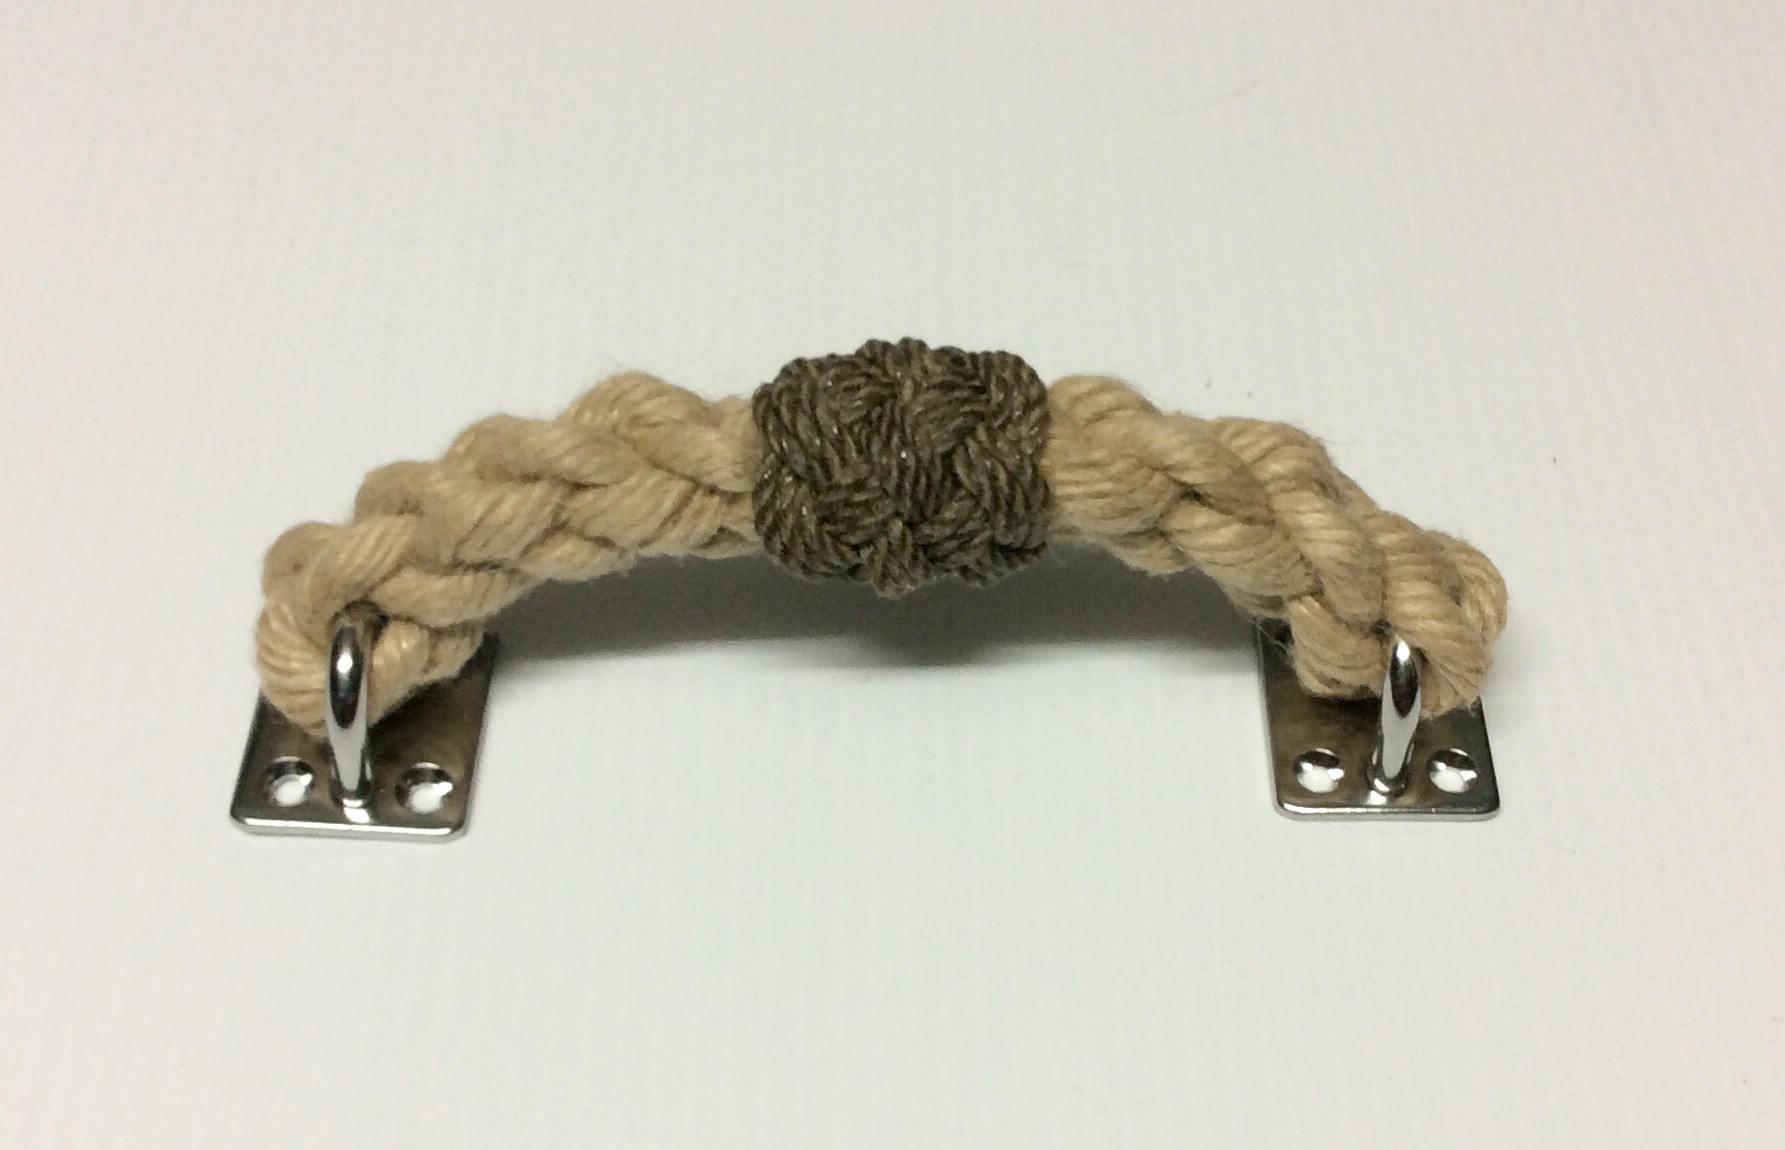 ROPE DRAWER PULL handles handmade natural Hemp rope look a like ...